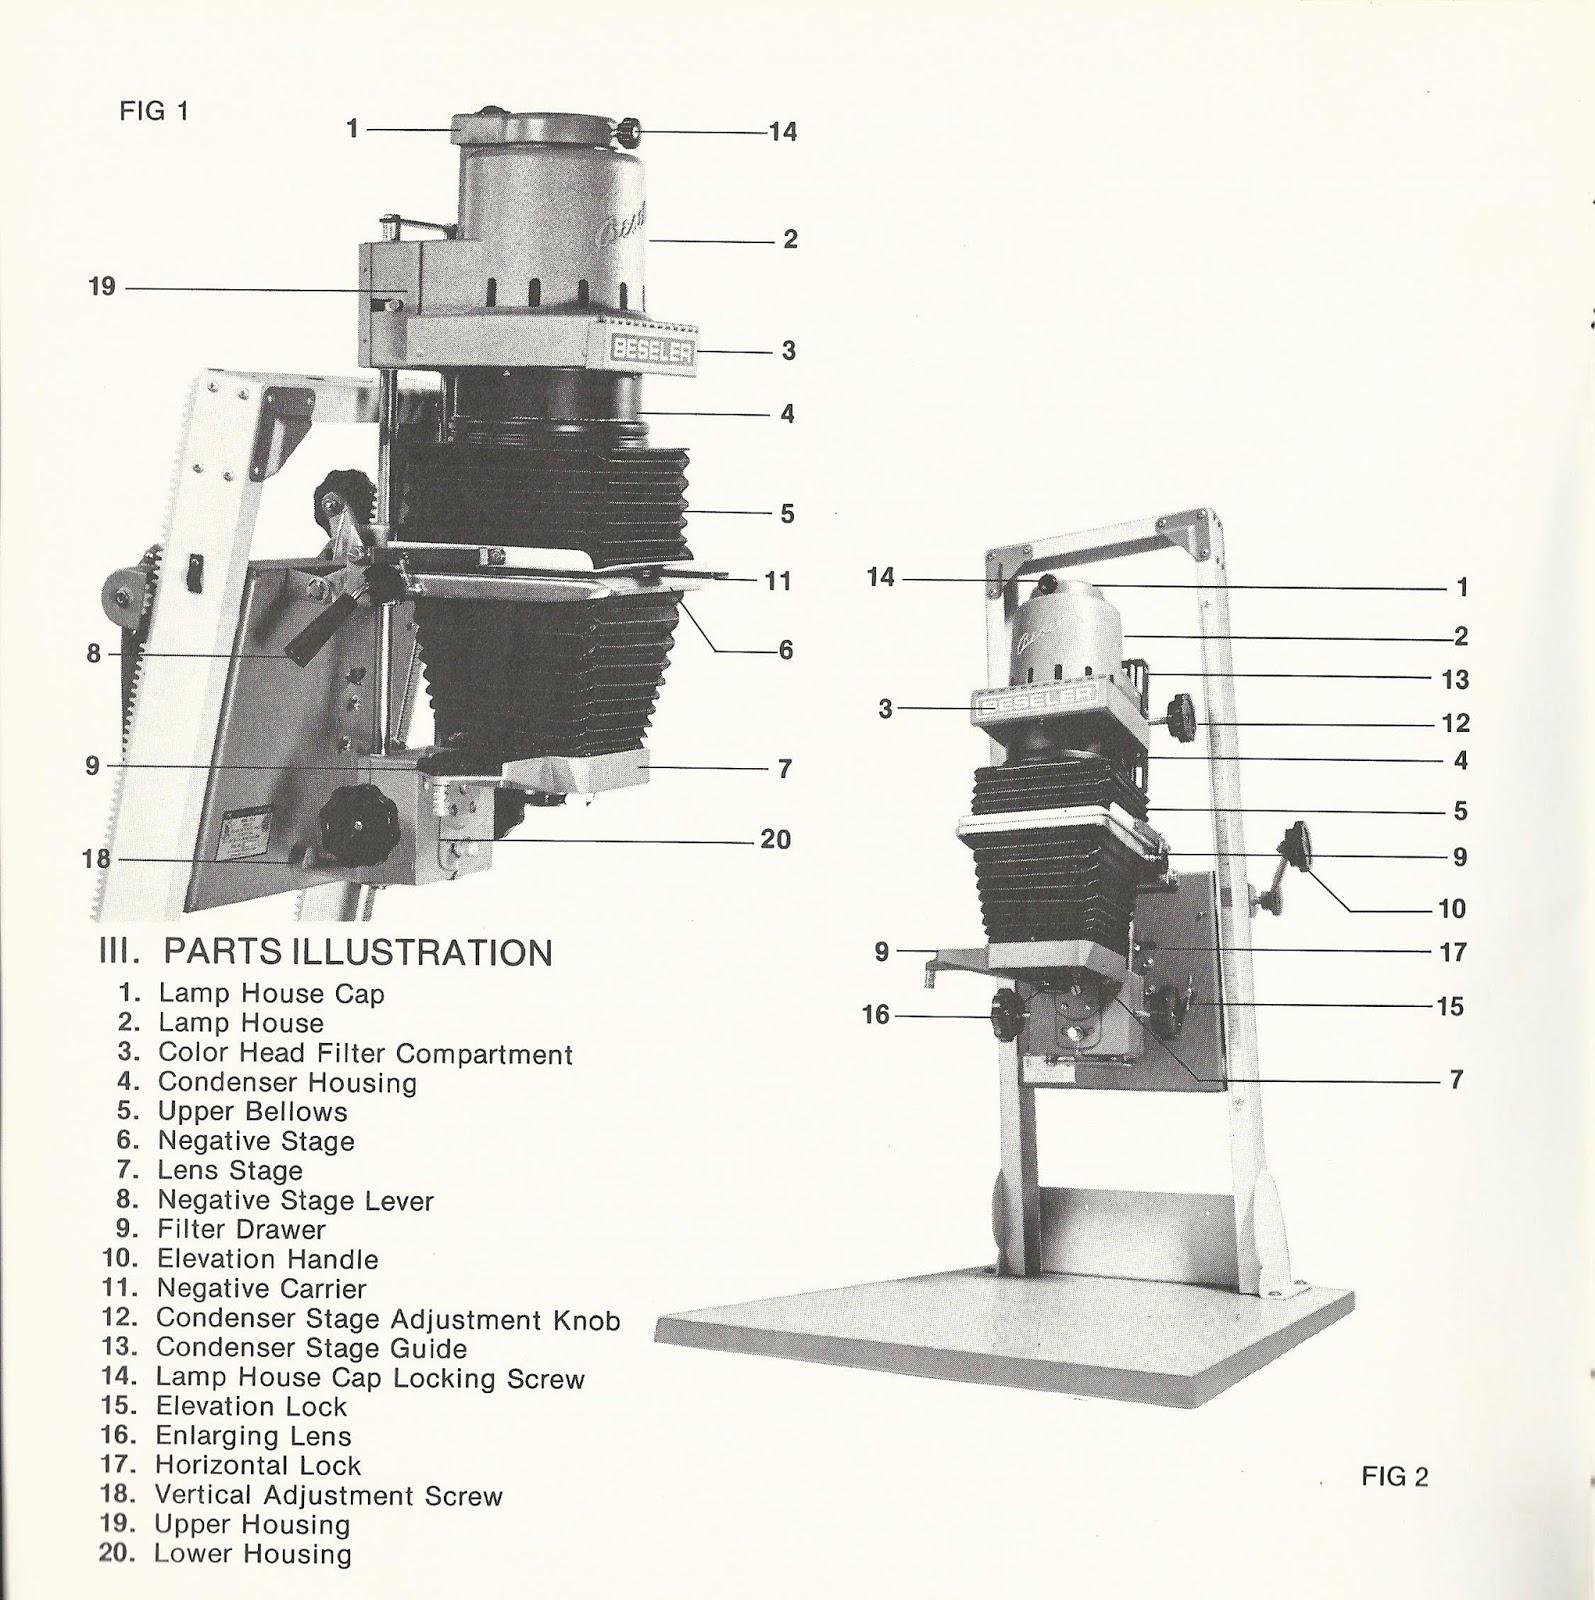 condenser adjustment knob